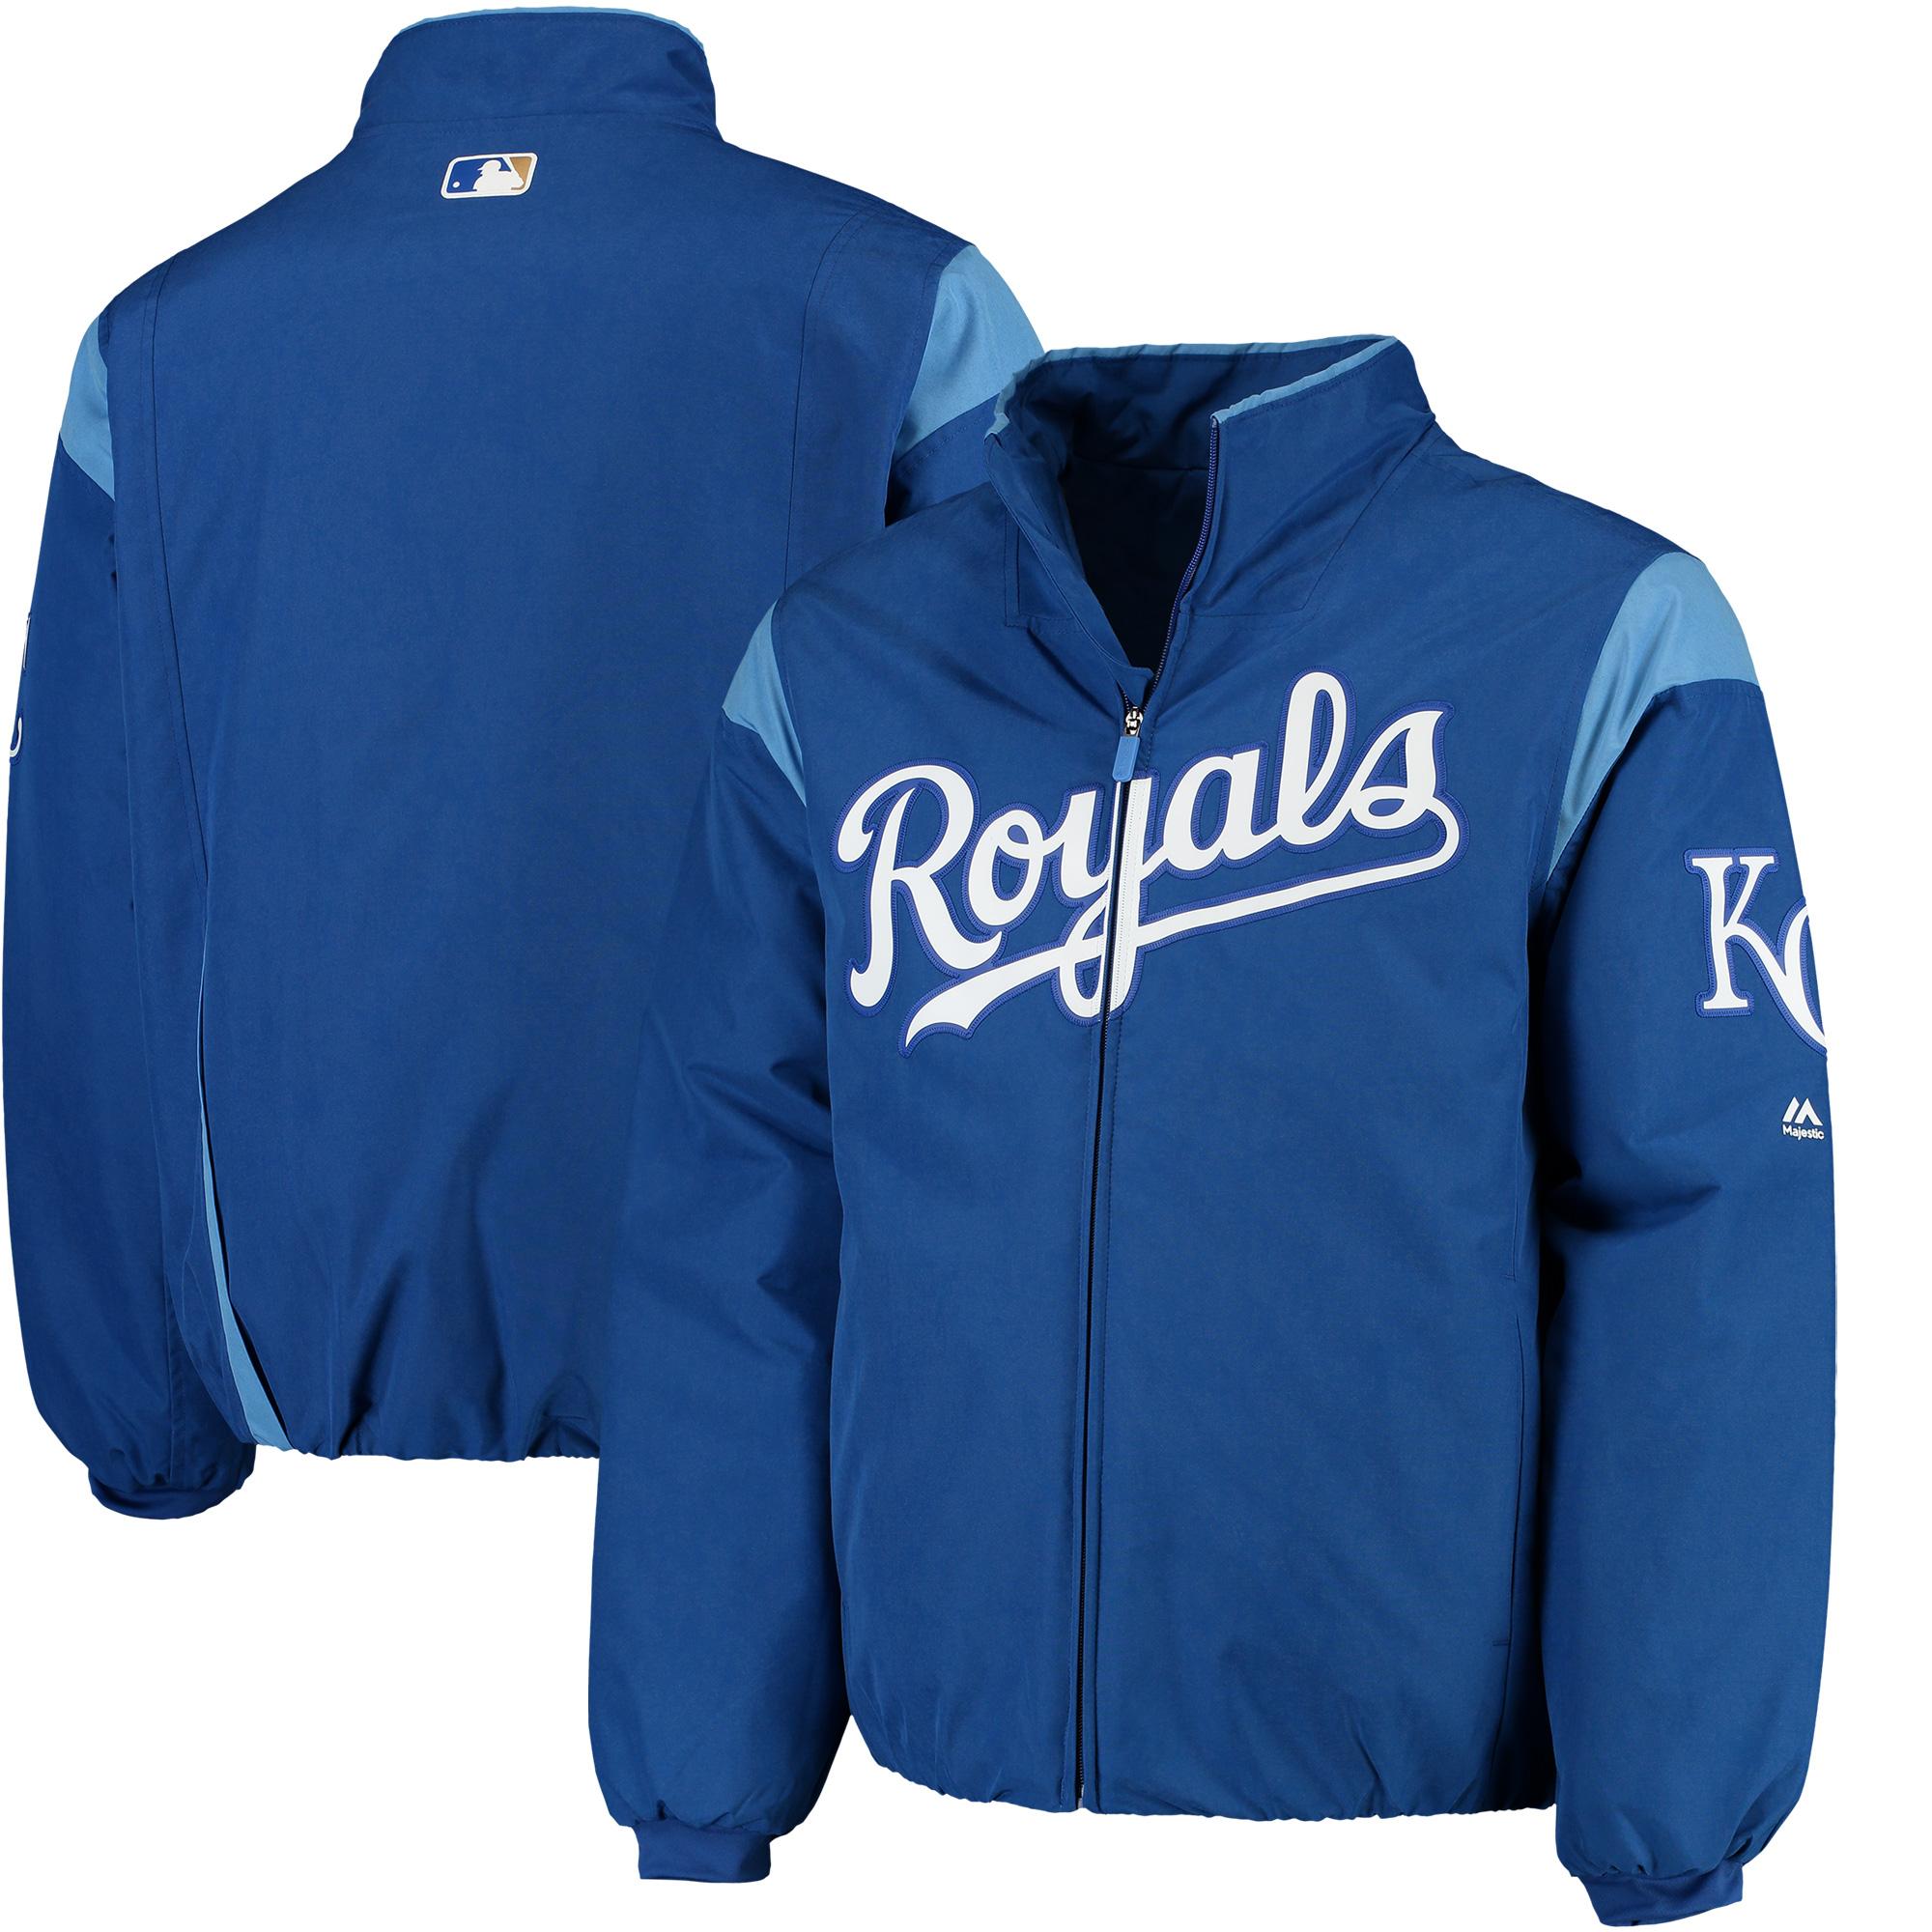 Kansas City Royals Majestic On-Field Therma Base Thermal Full-Zip Jacket - Royal